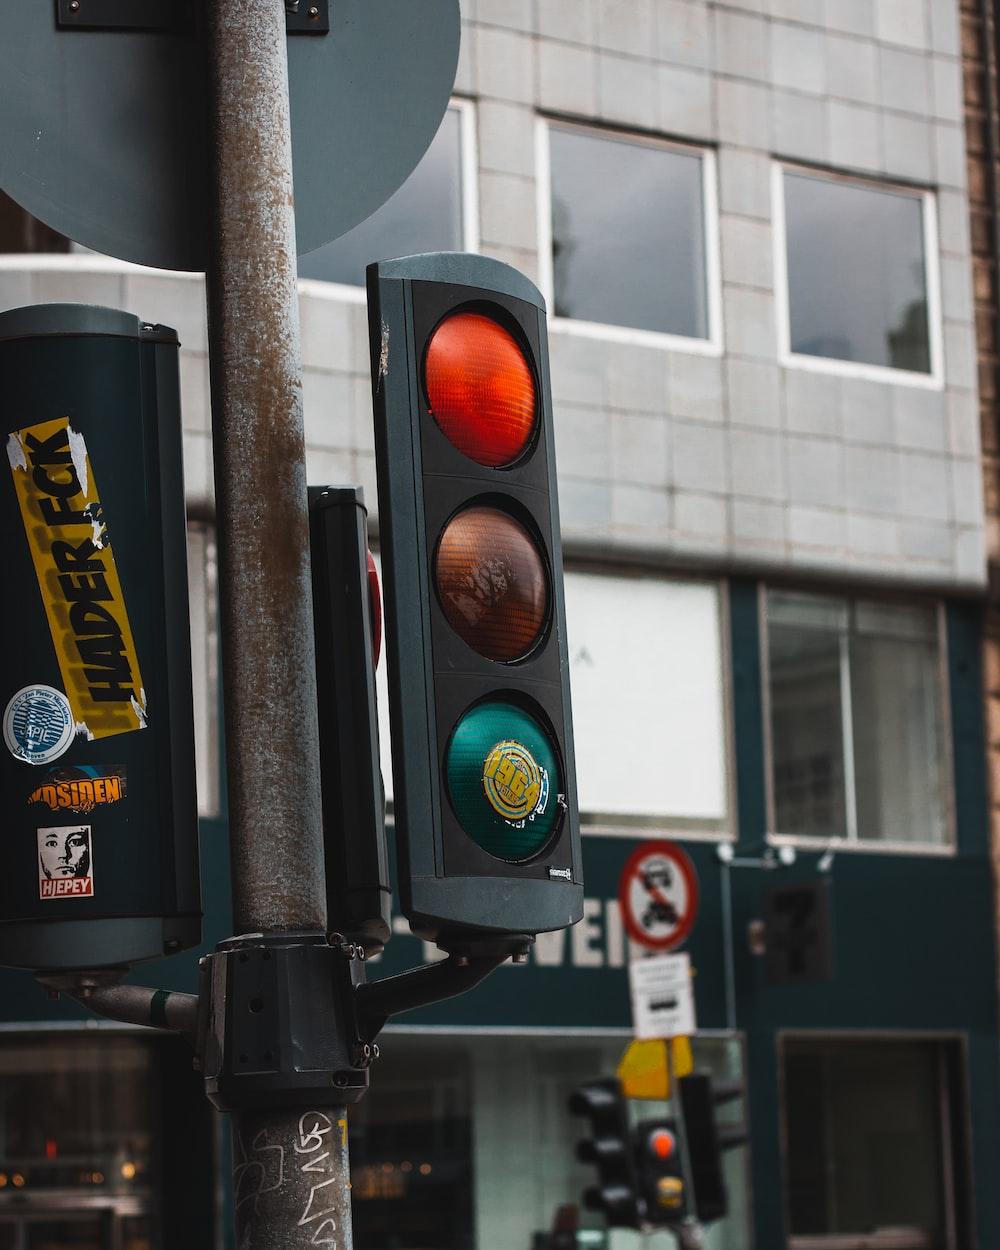 multicolored street lights